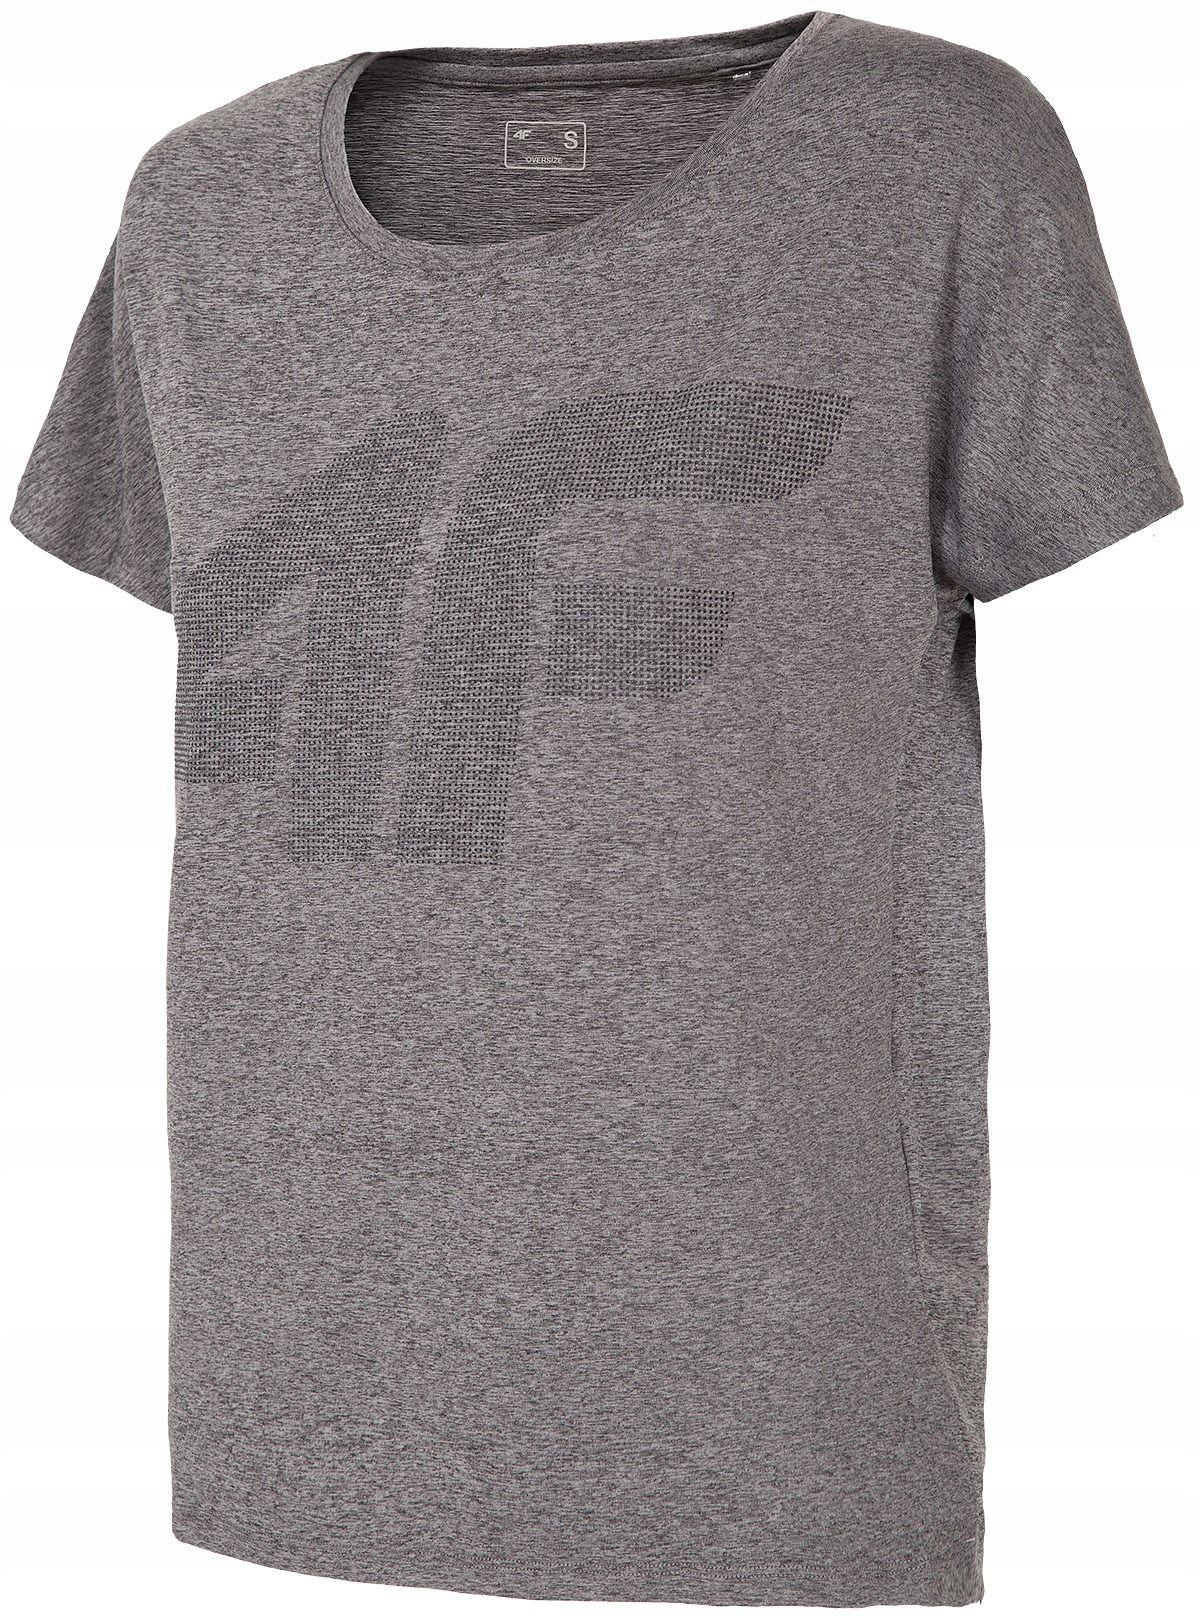 T-Shirt Damski Termoaktywny 4F TSDF005 M Oversize